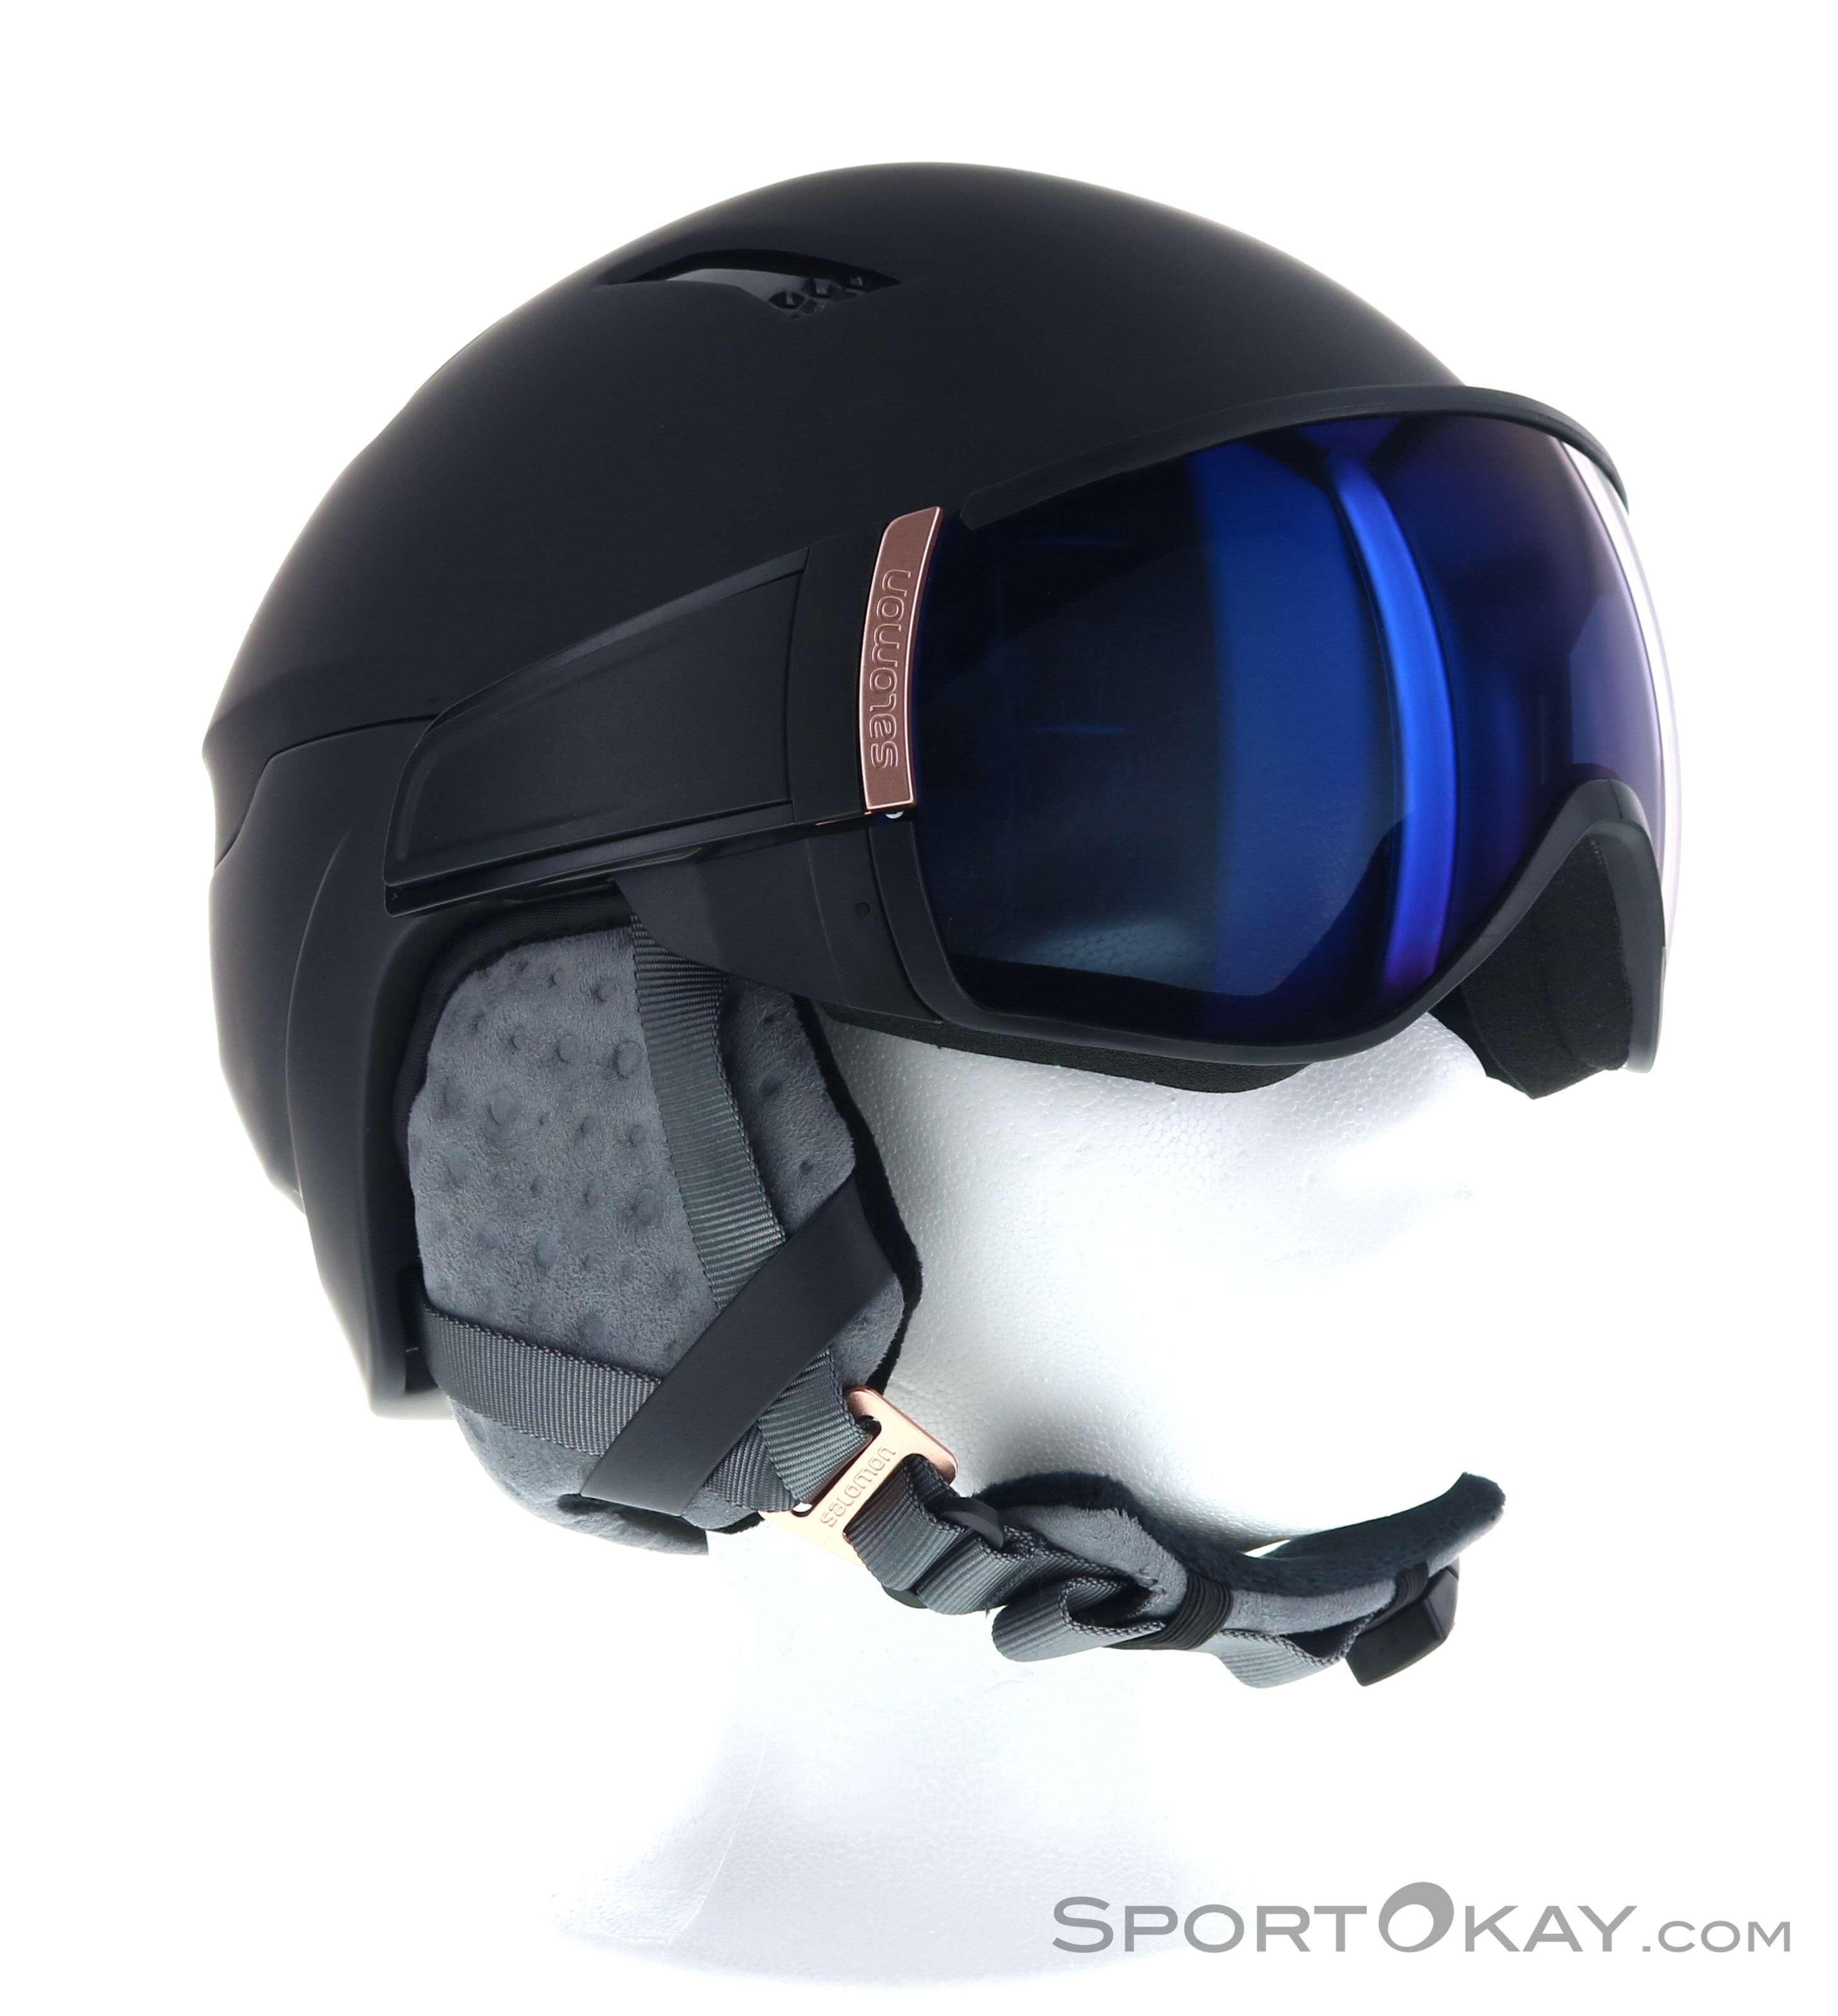 Parpadeo Percibir Celo  Salomon Mirage Womens Ski Helmet - Ski Helmets - Ski Helmets & Accessory -  Ski & Freeride - All